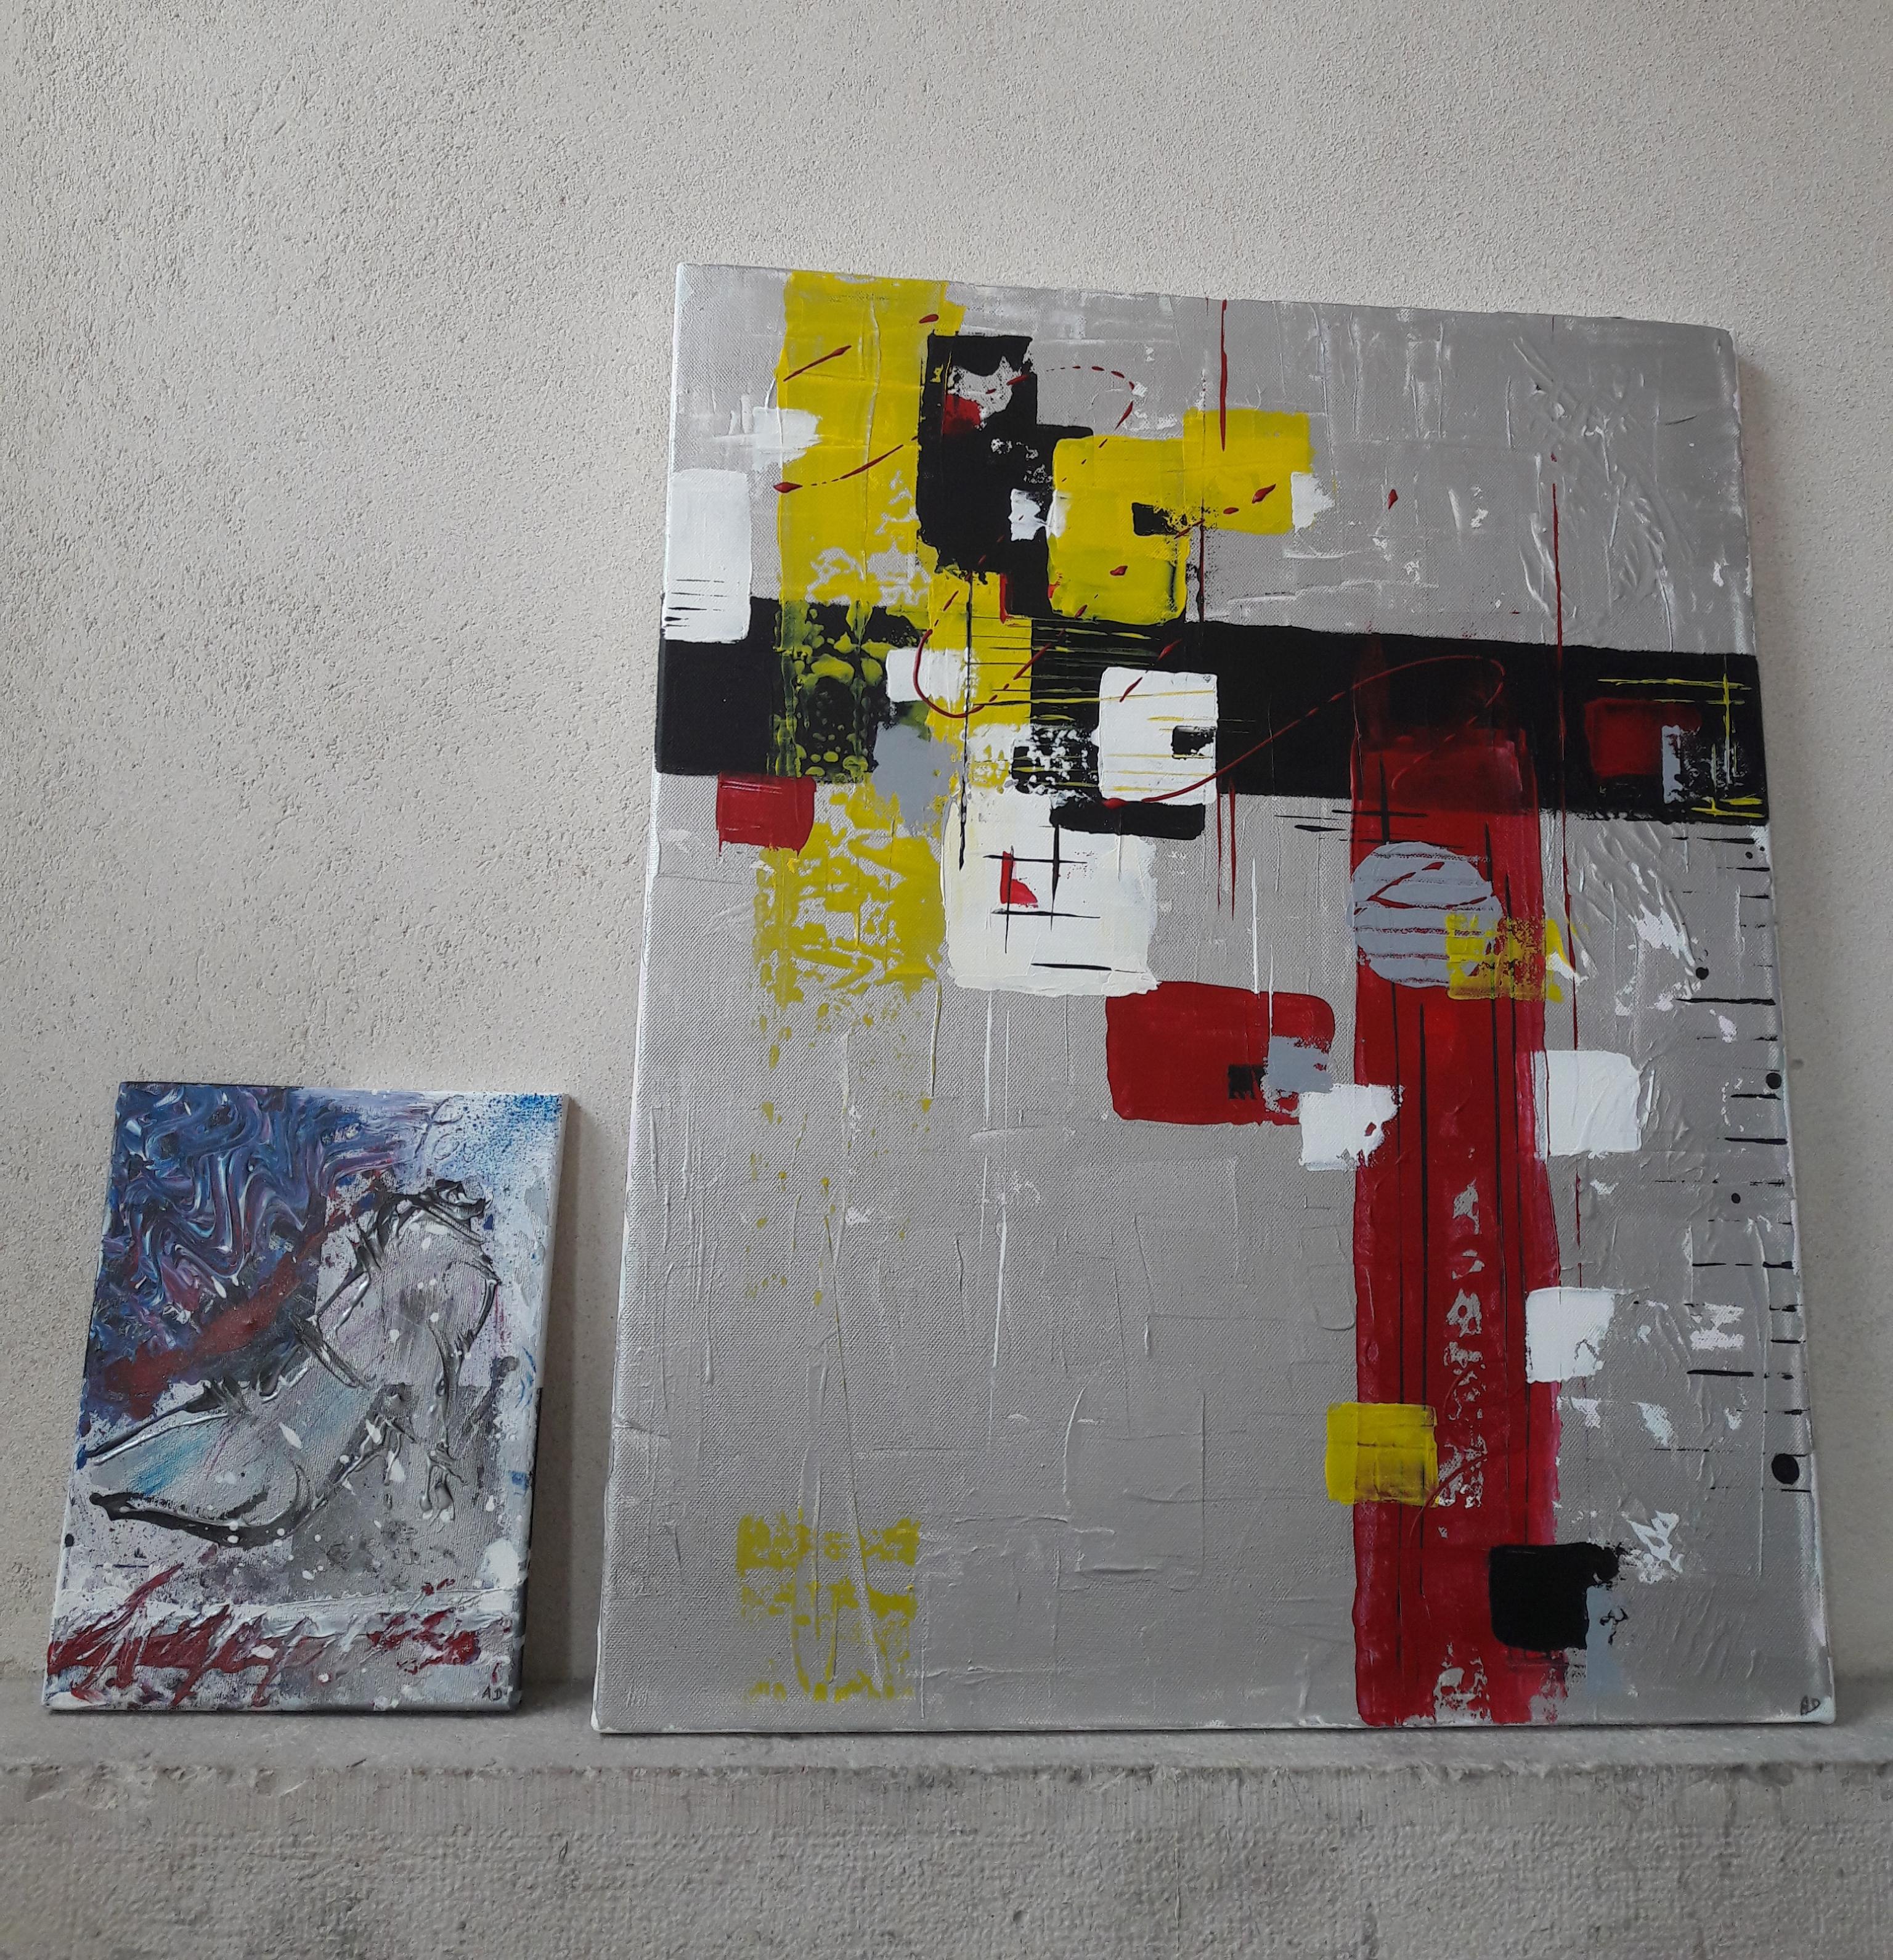 Exposition d'Aurélie DUBIEF